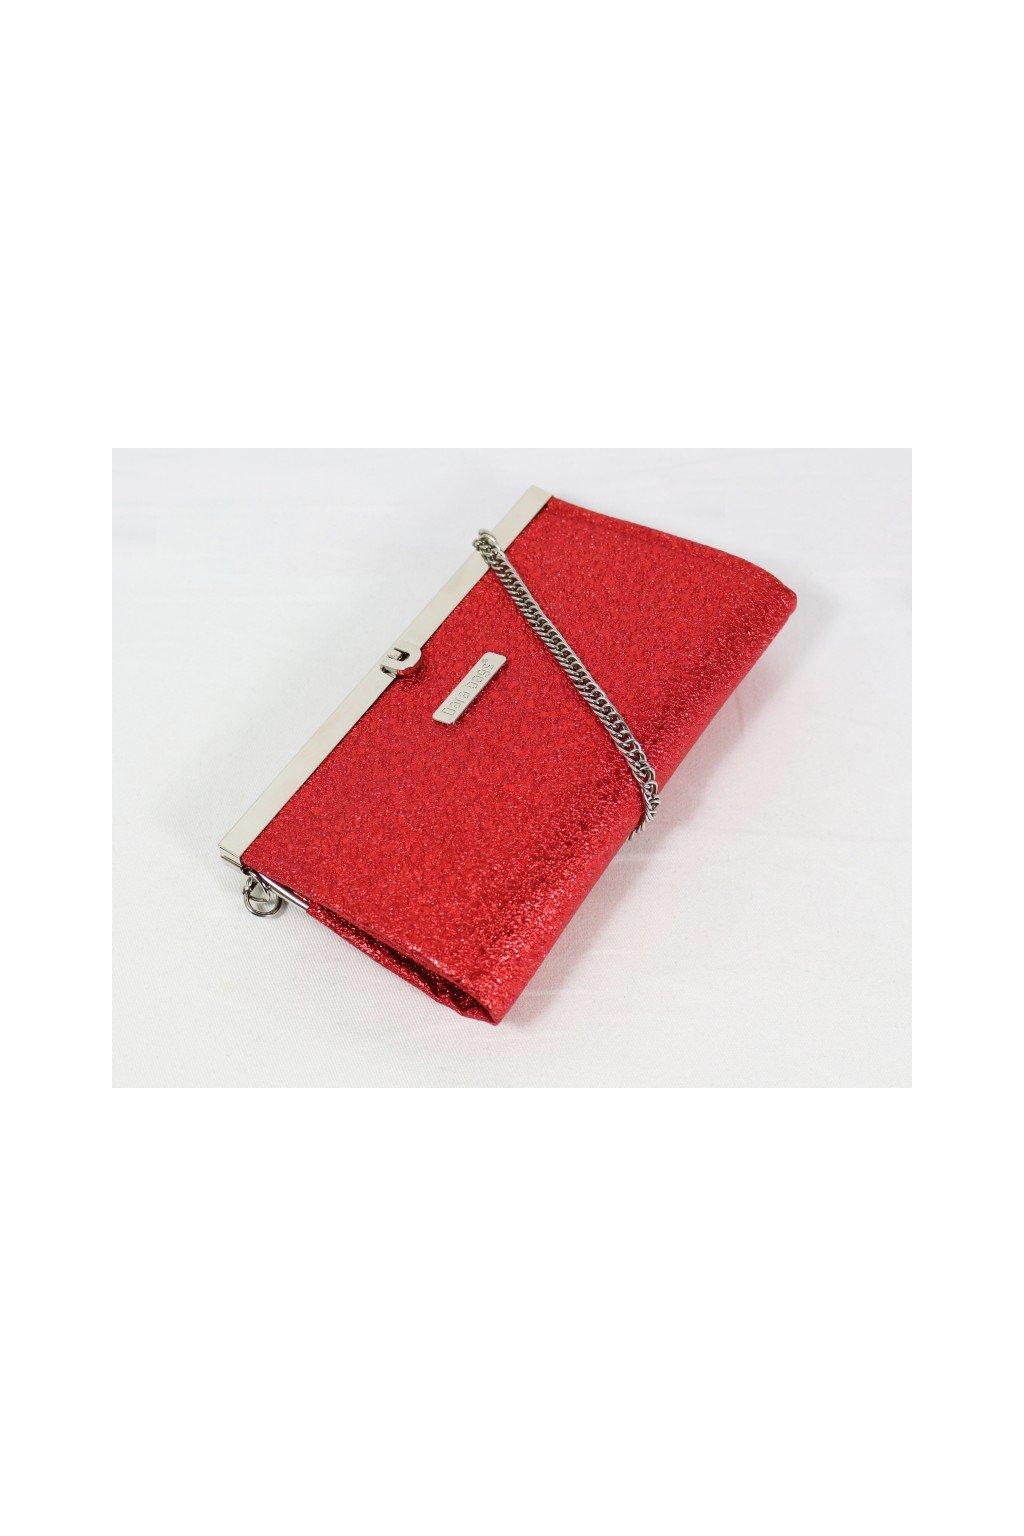 Mala kabelka Merci Dara bags cervena 1